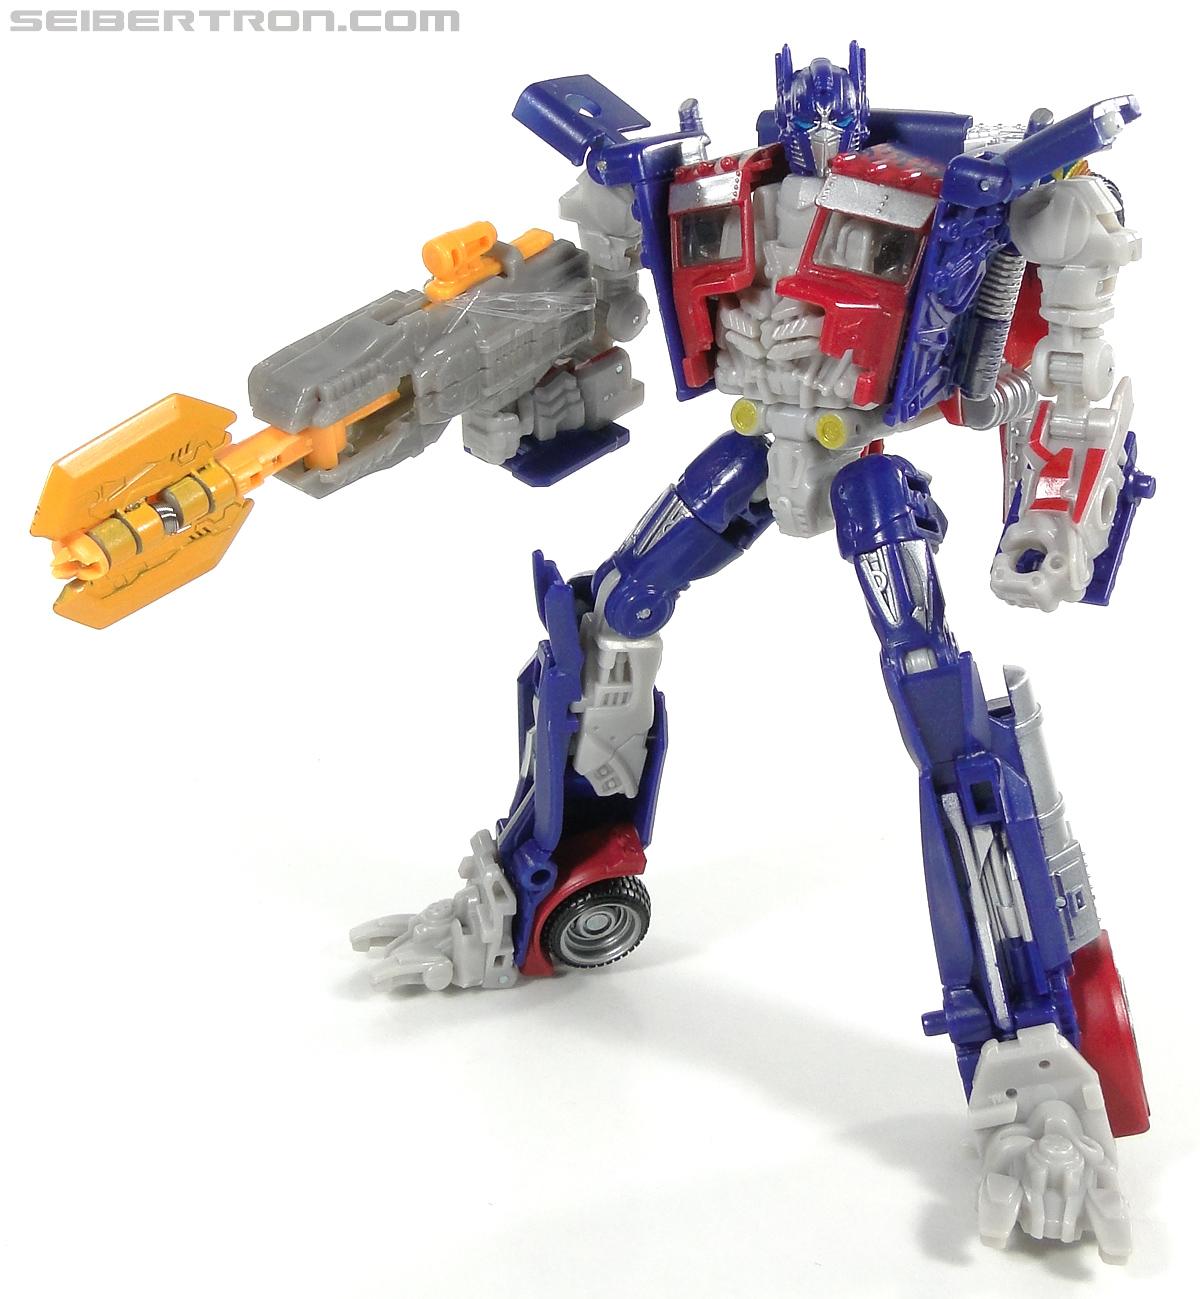 Transformers Dark of the Moon Optimus Prime (Image #110 of 145)